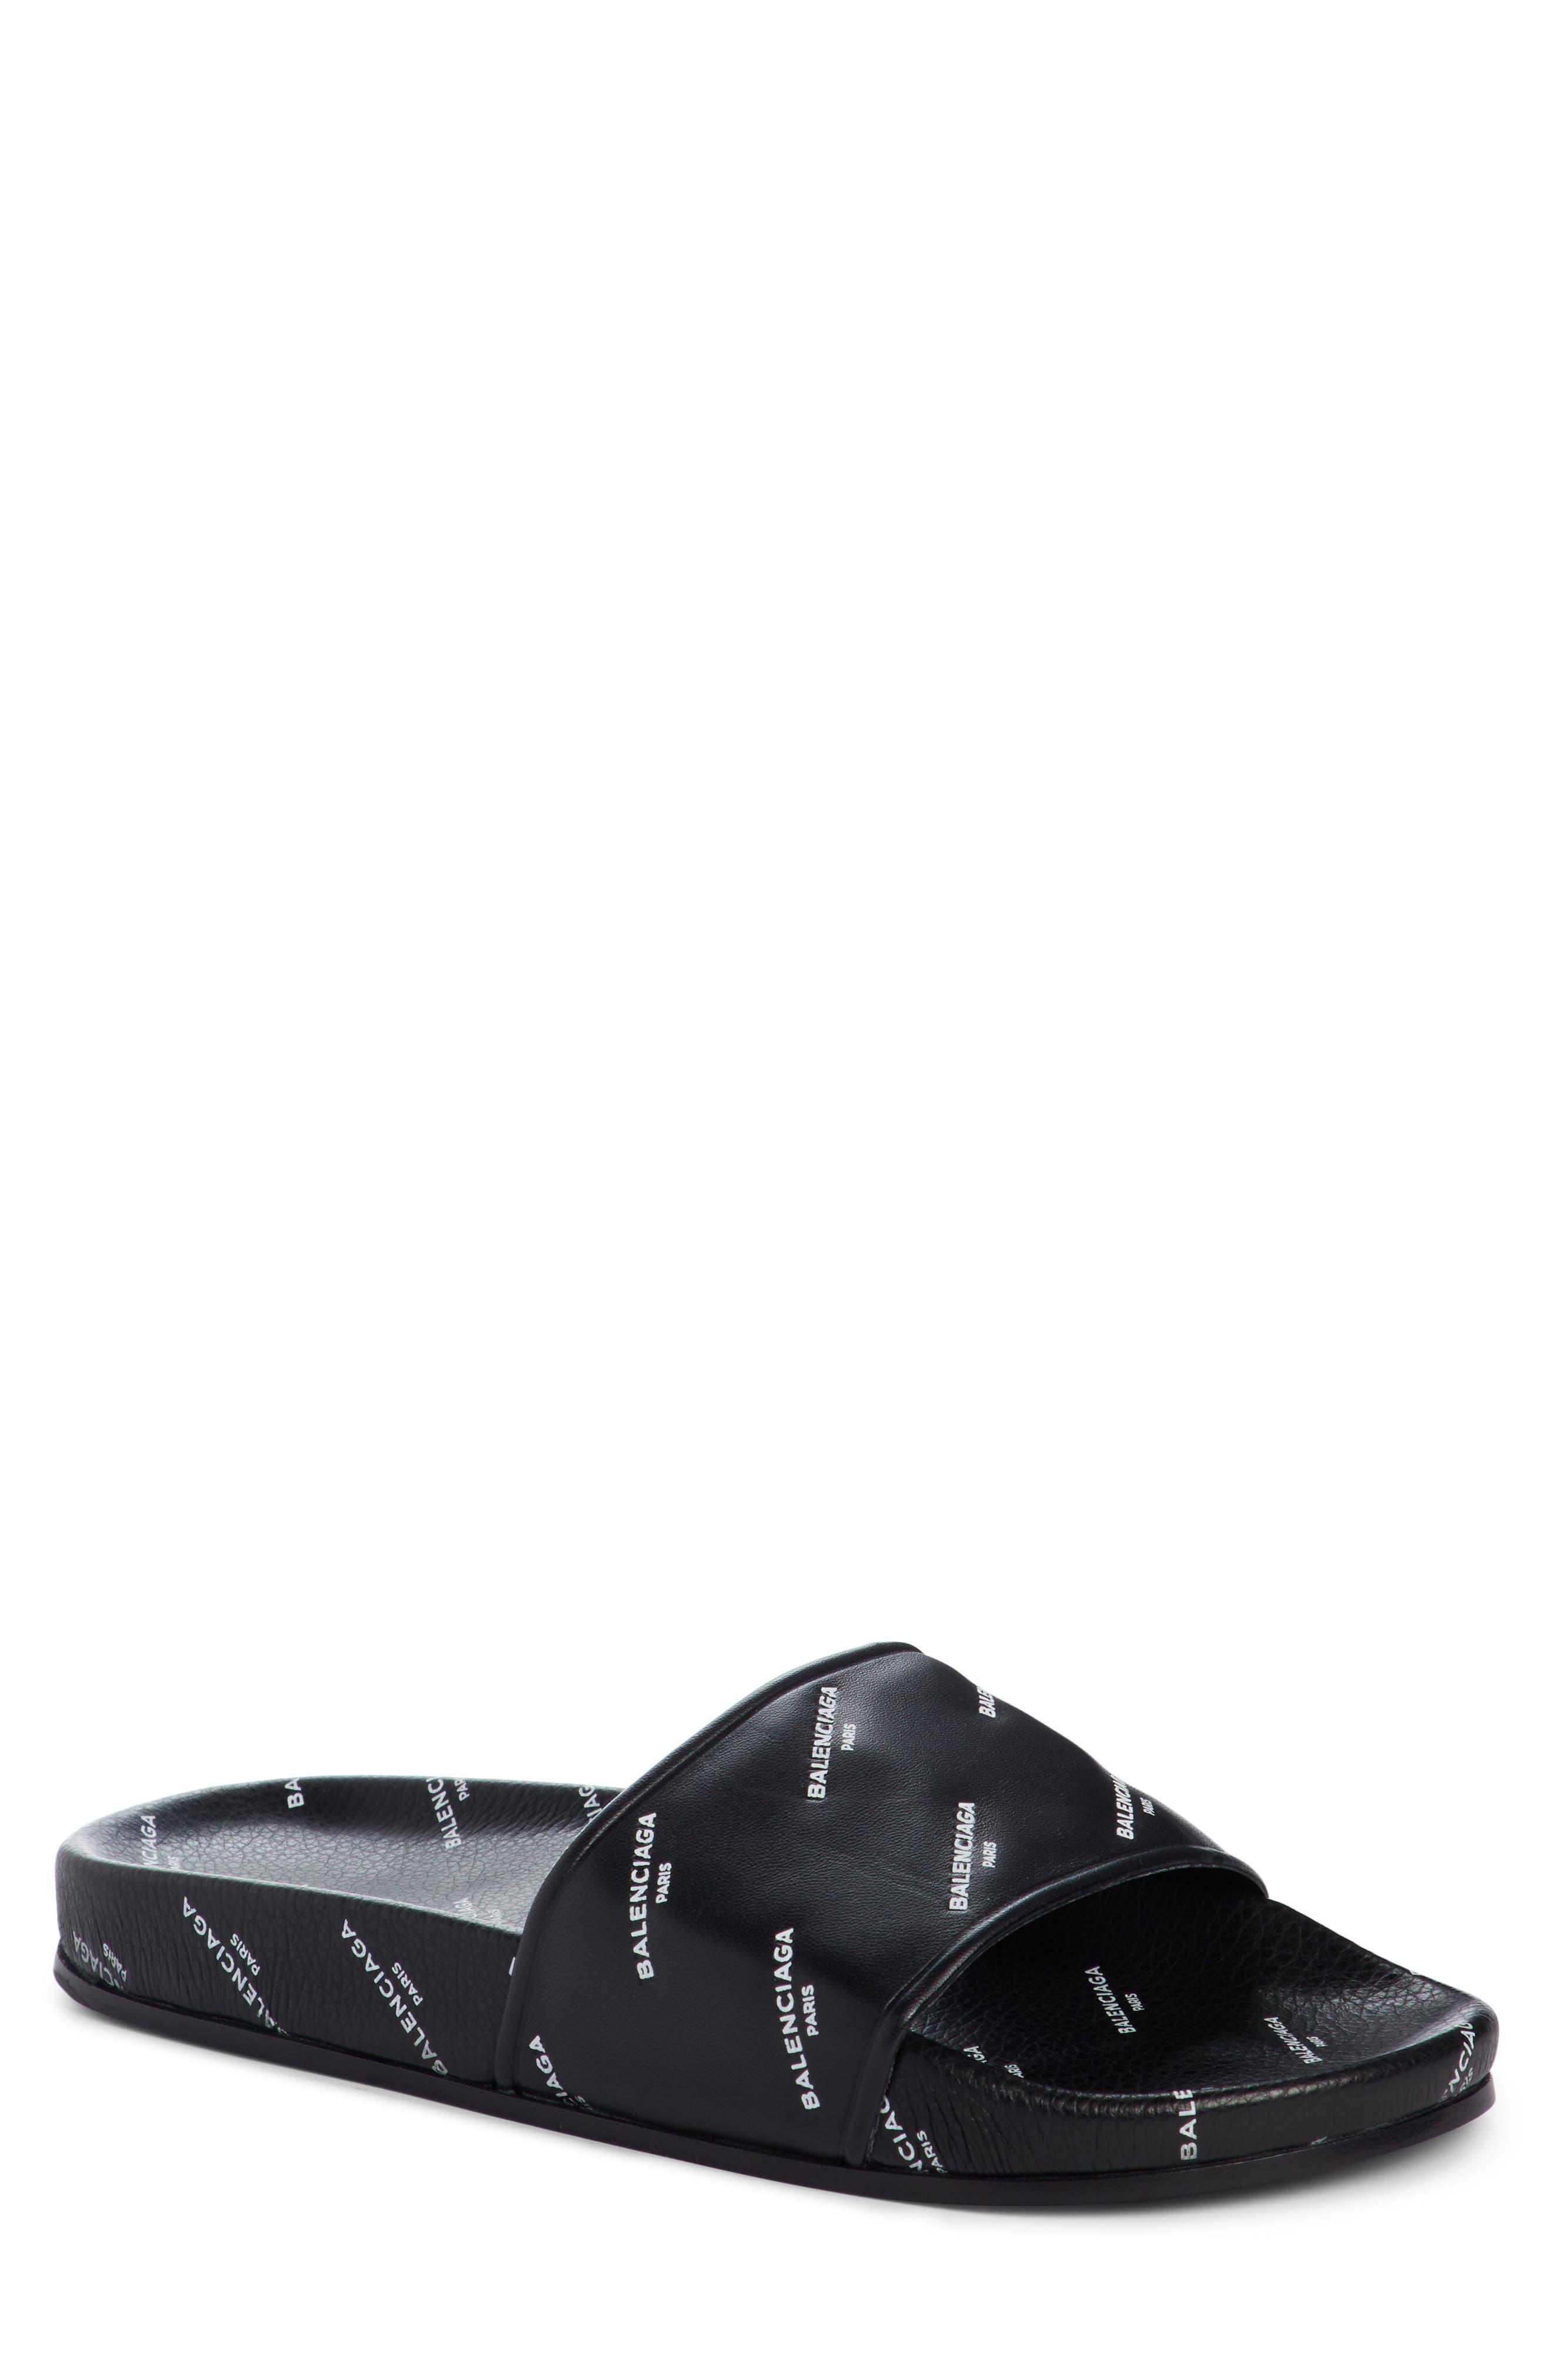 Alternate Image 1 Selected - Balenciaga Logo Print Slide Sandal (Women)